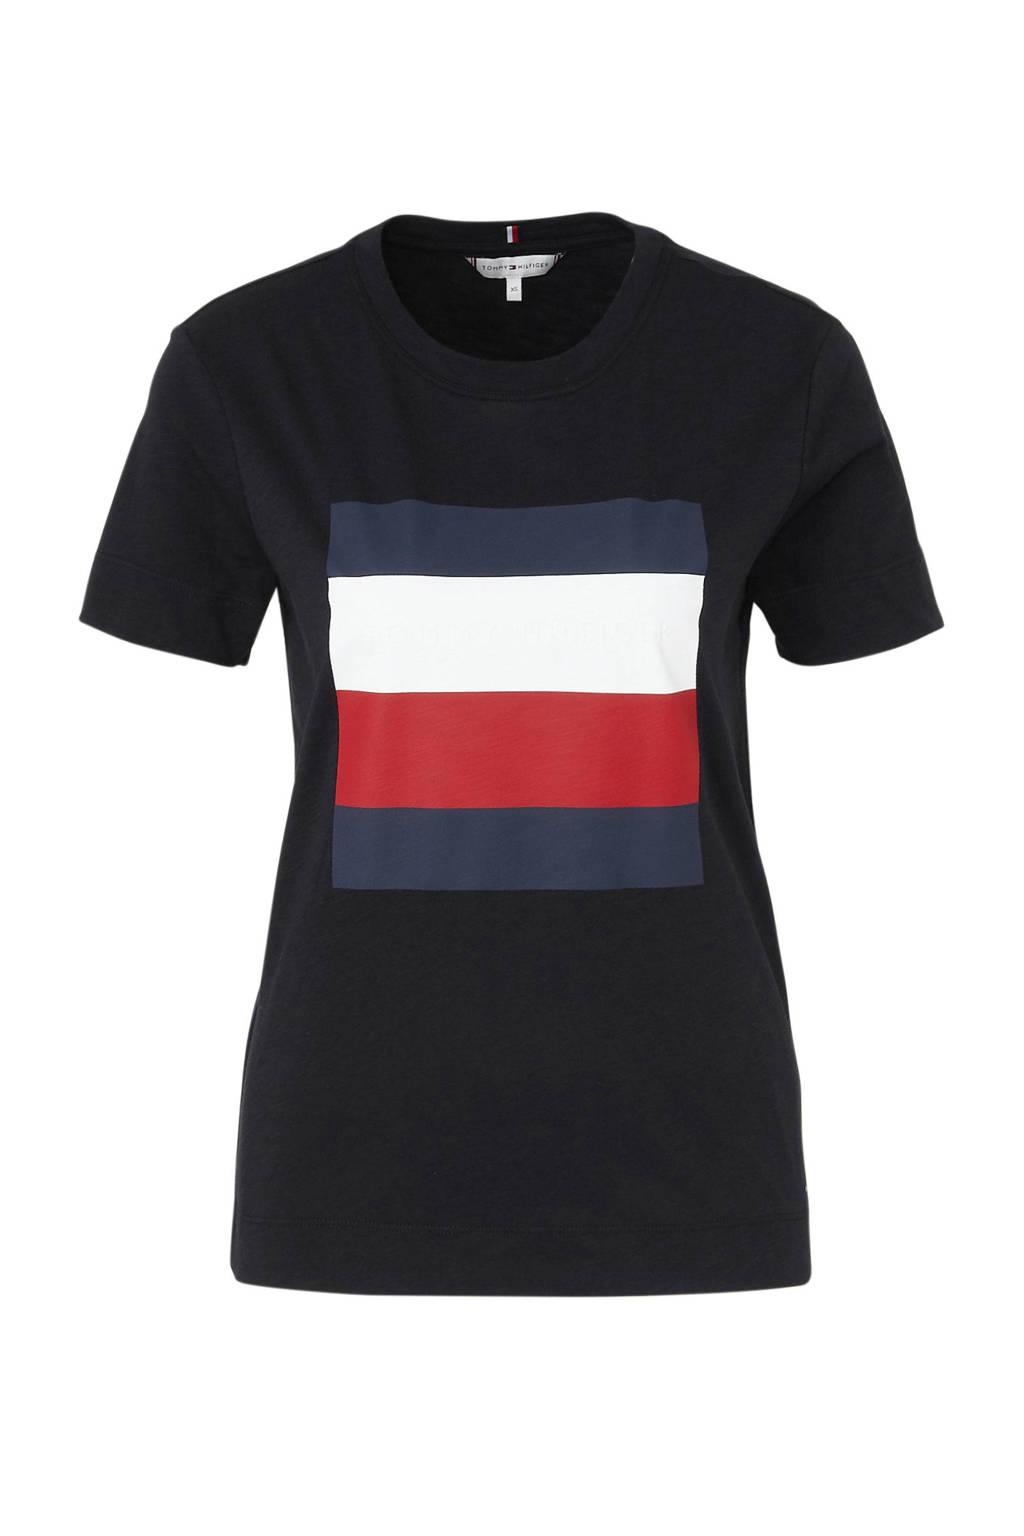 Tommy Hilfiger T-shirt met logo donkerblauw/wit/rood, Donkerblauw/wit/rood